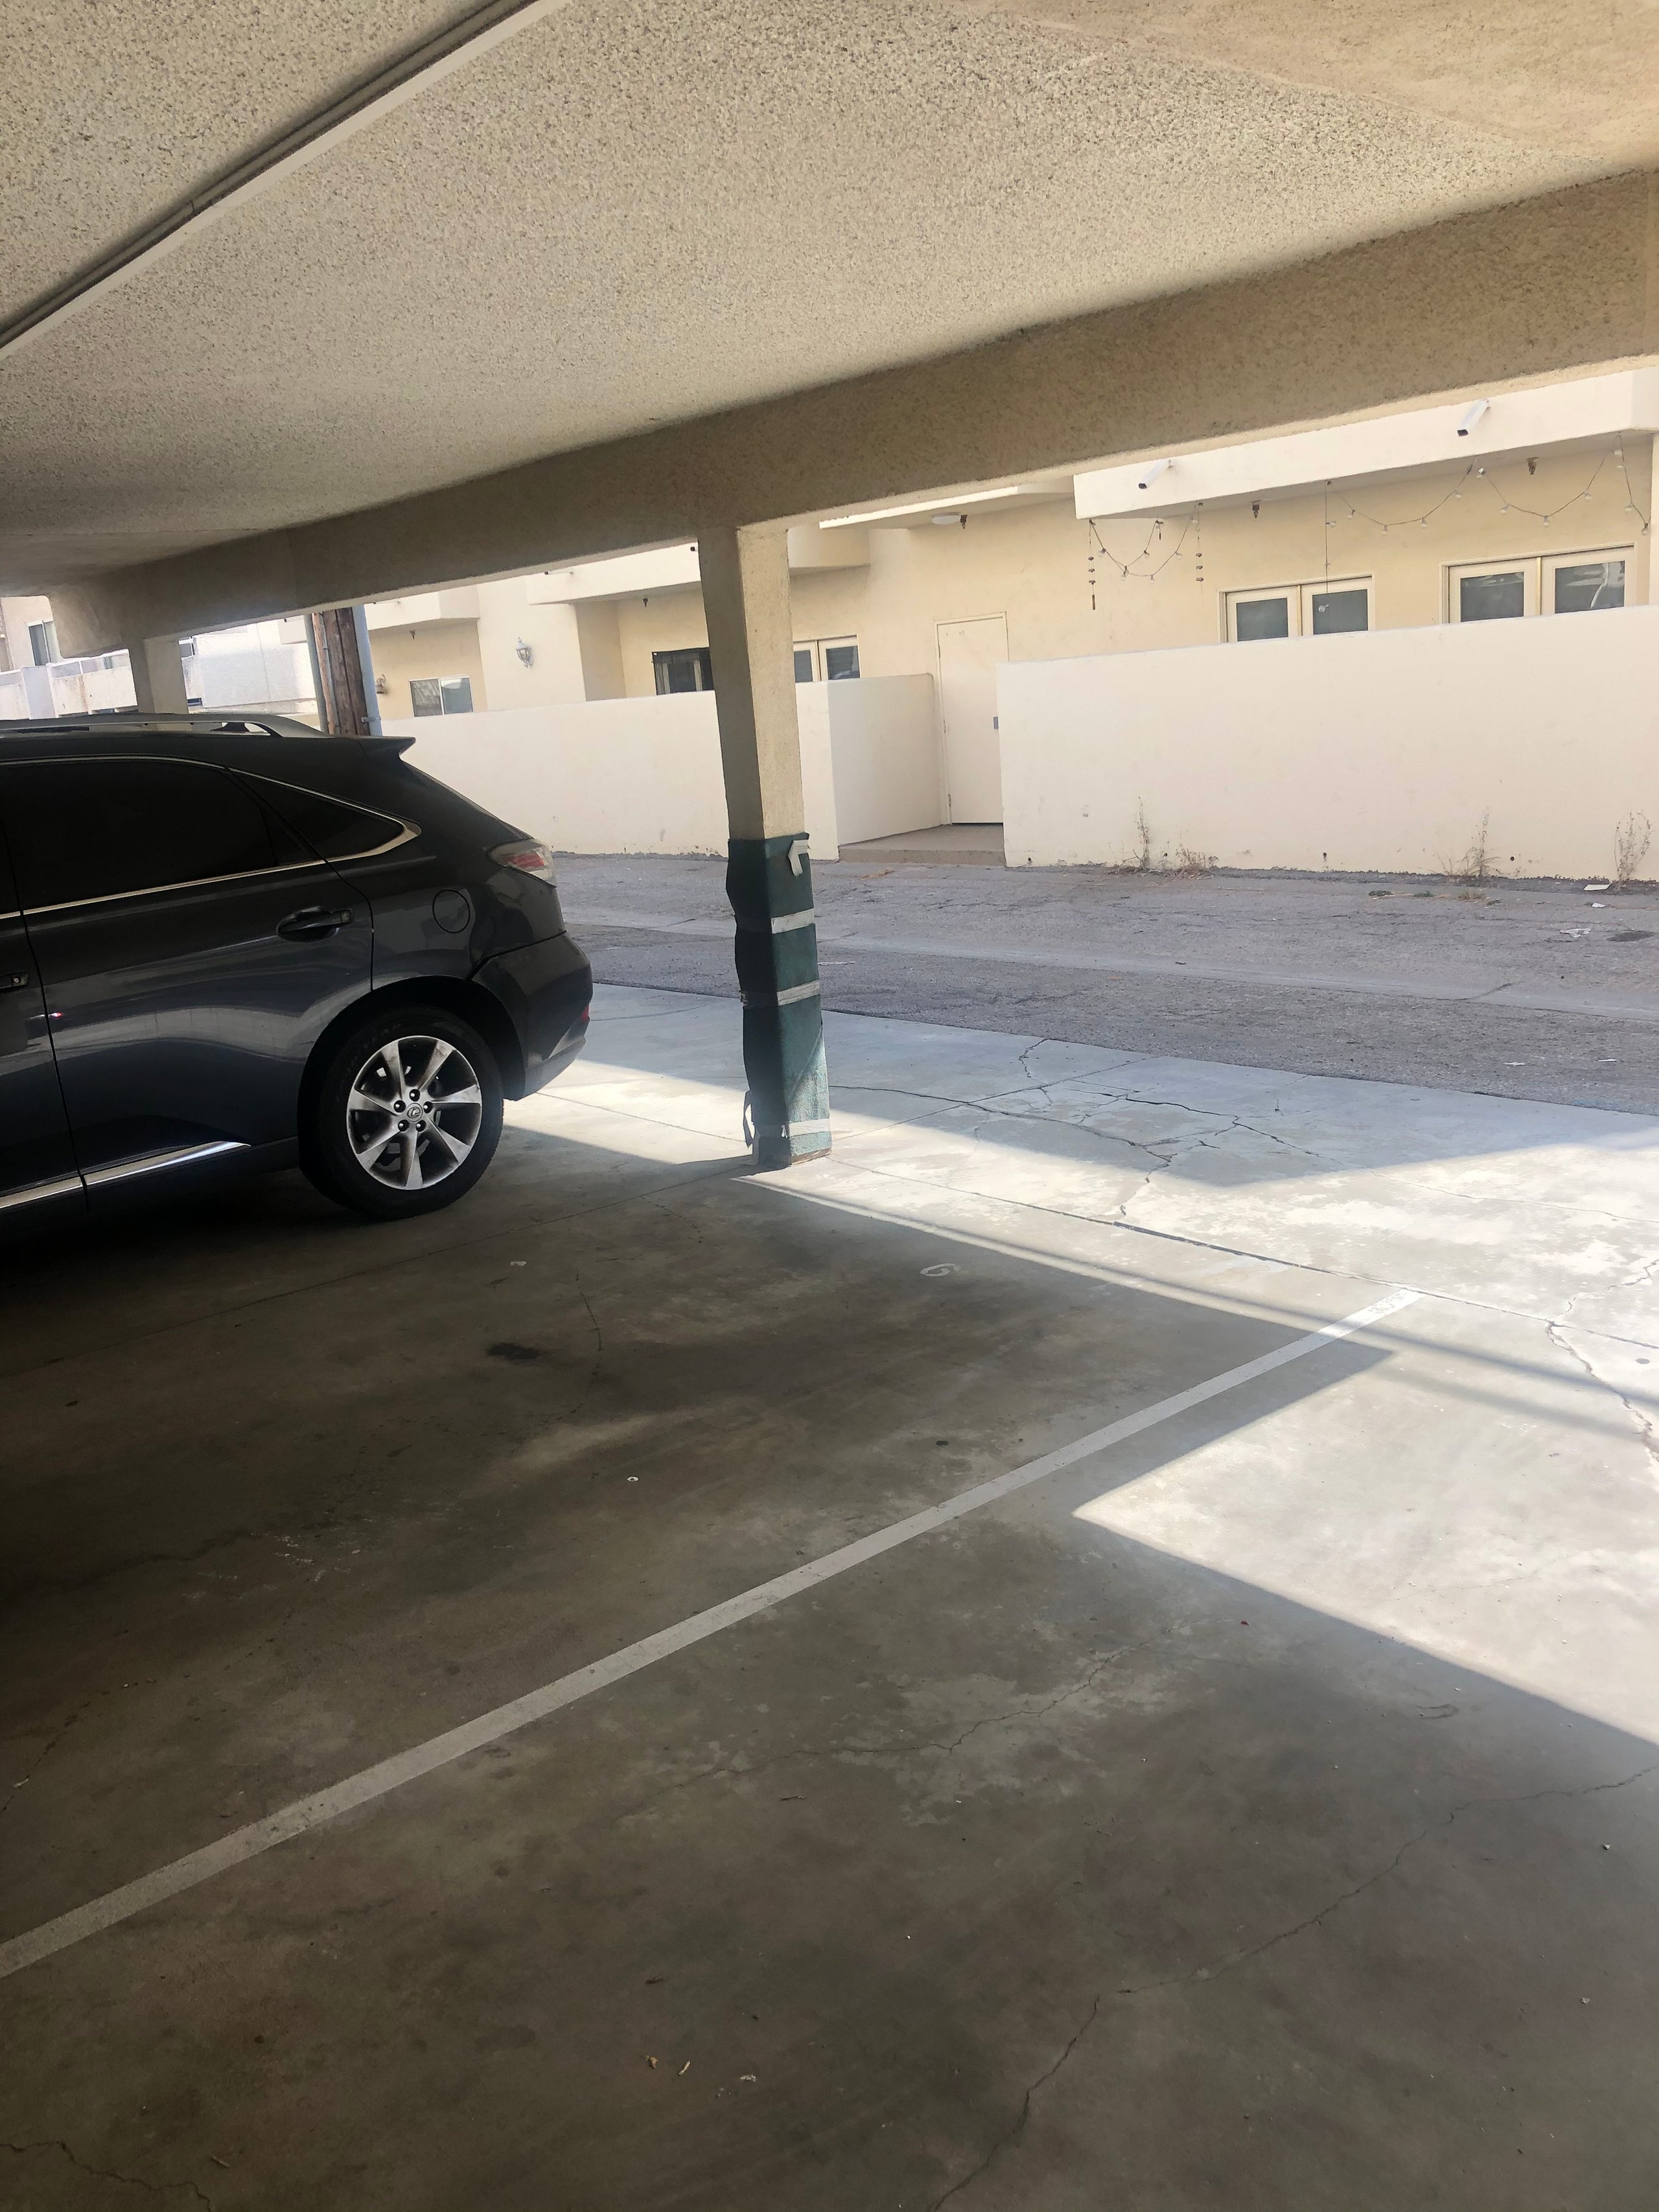 19x8 Parking Lot self storage unit